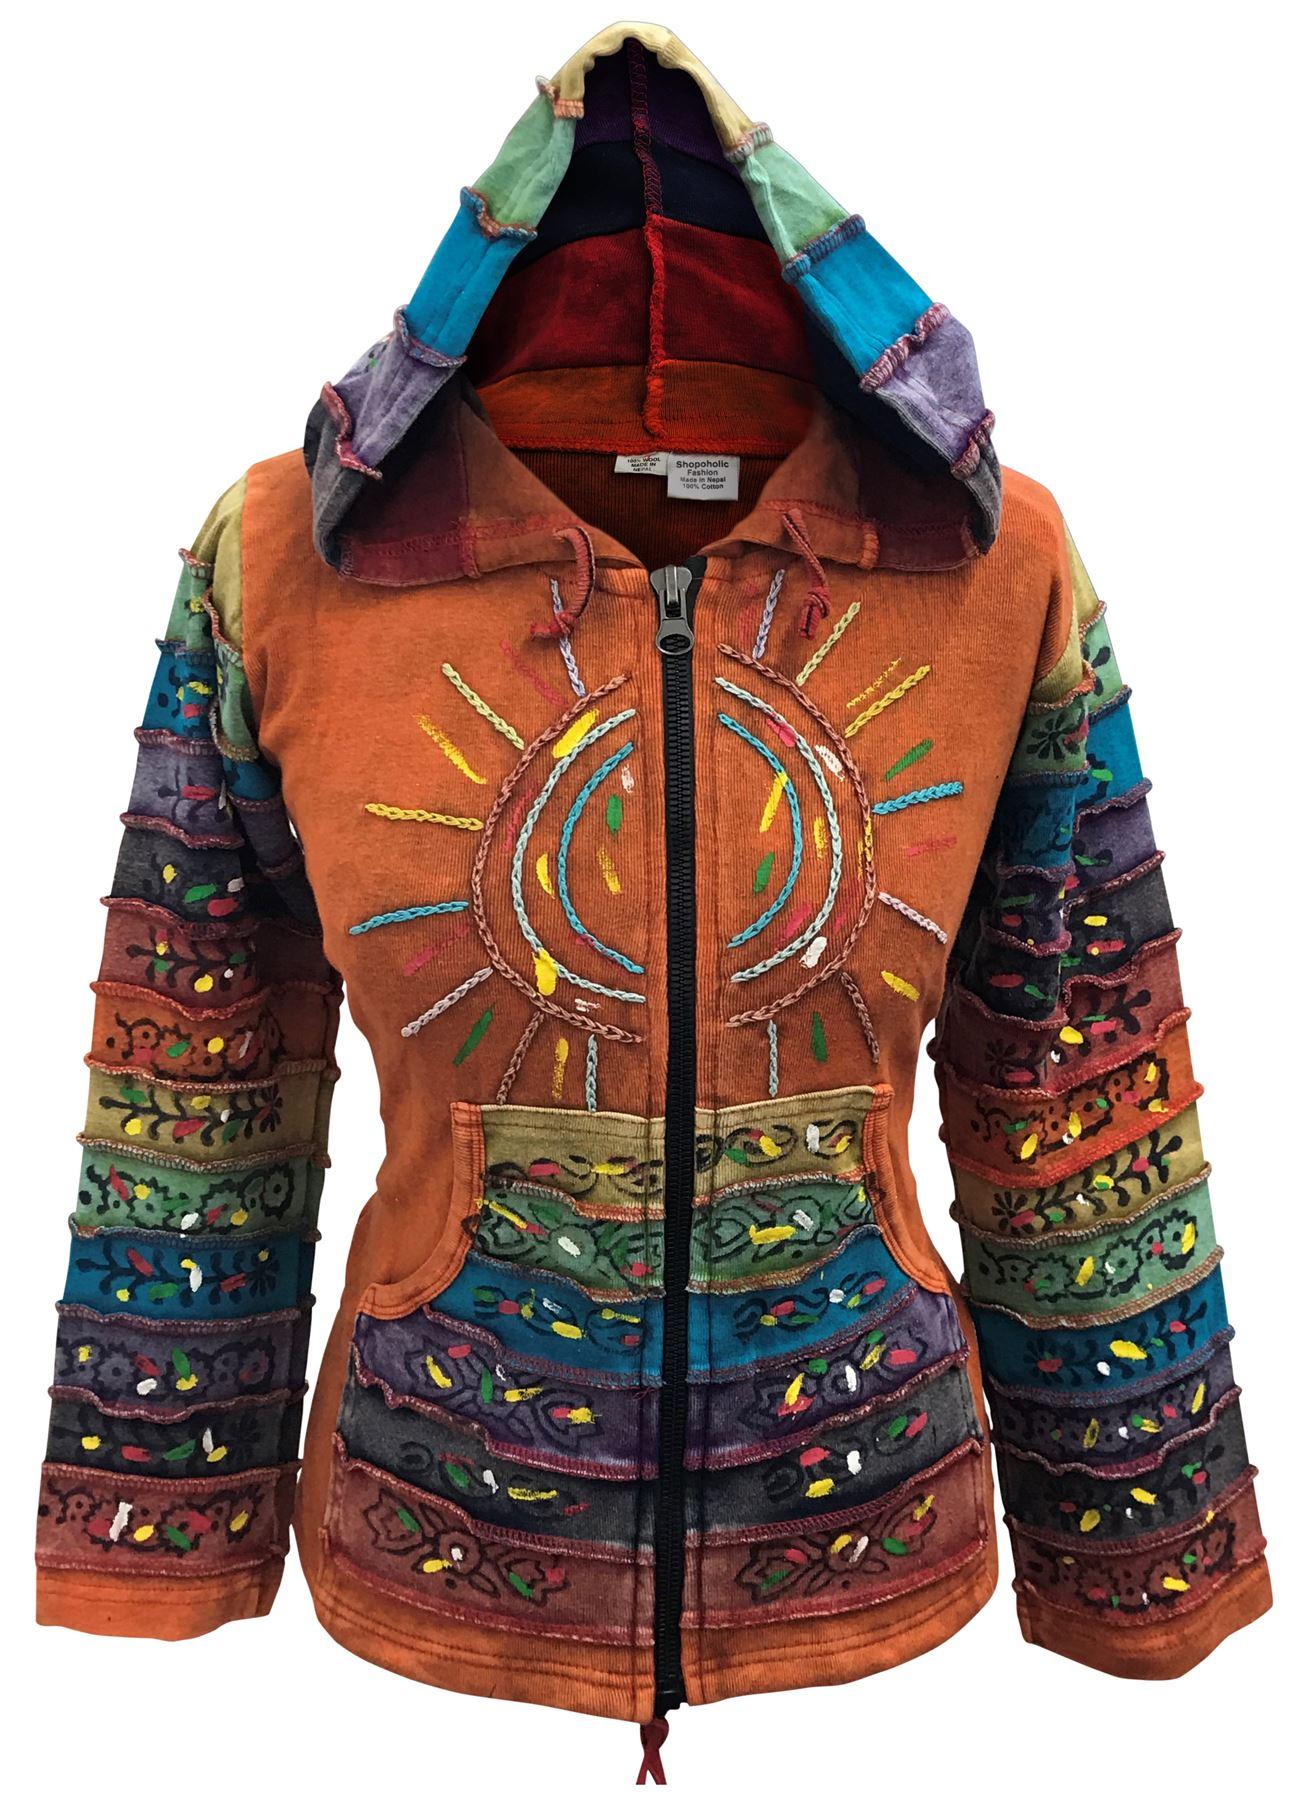 Women-039-s-Sun-Patchwork-Pixie-Hippy-Ribs-Hoodie-Light-Cotton-Hippie-Faded-Jacket thumbnail 11